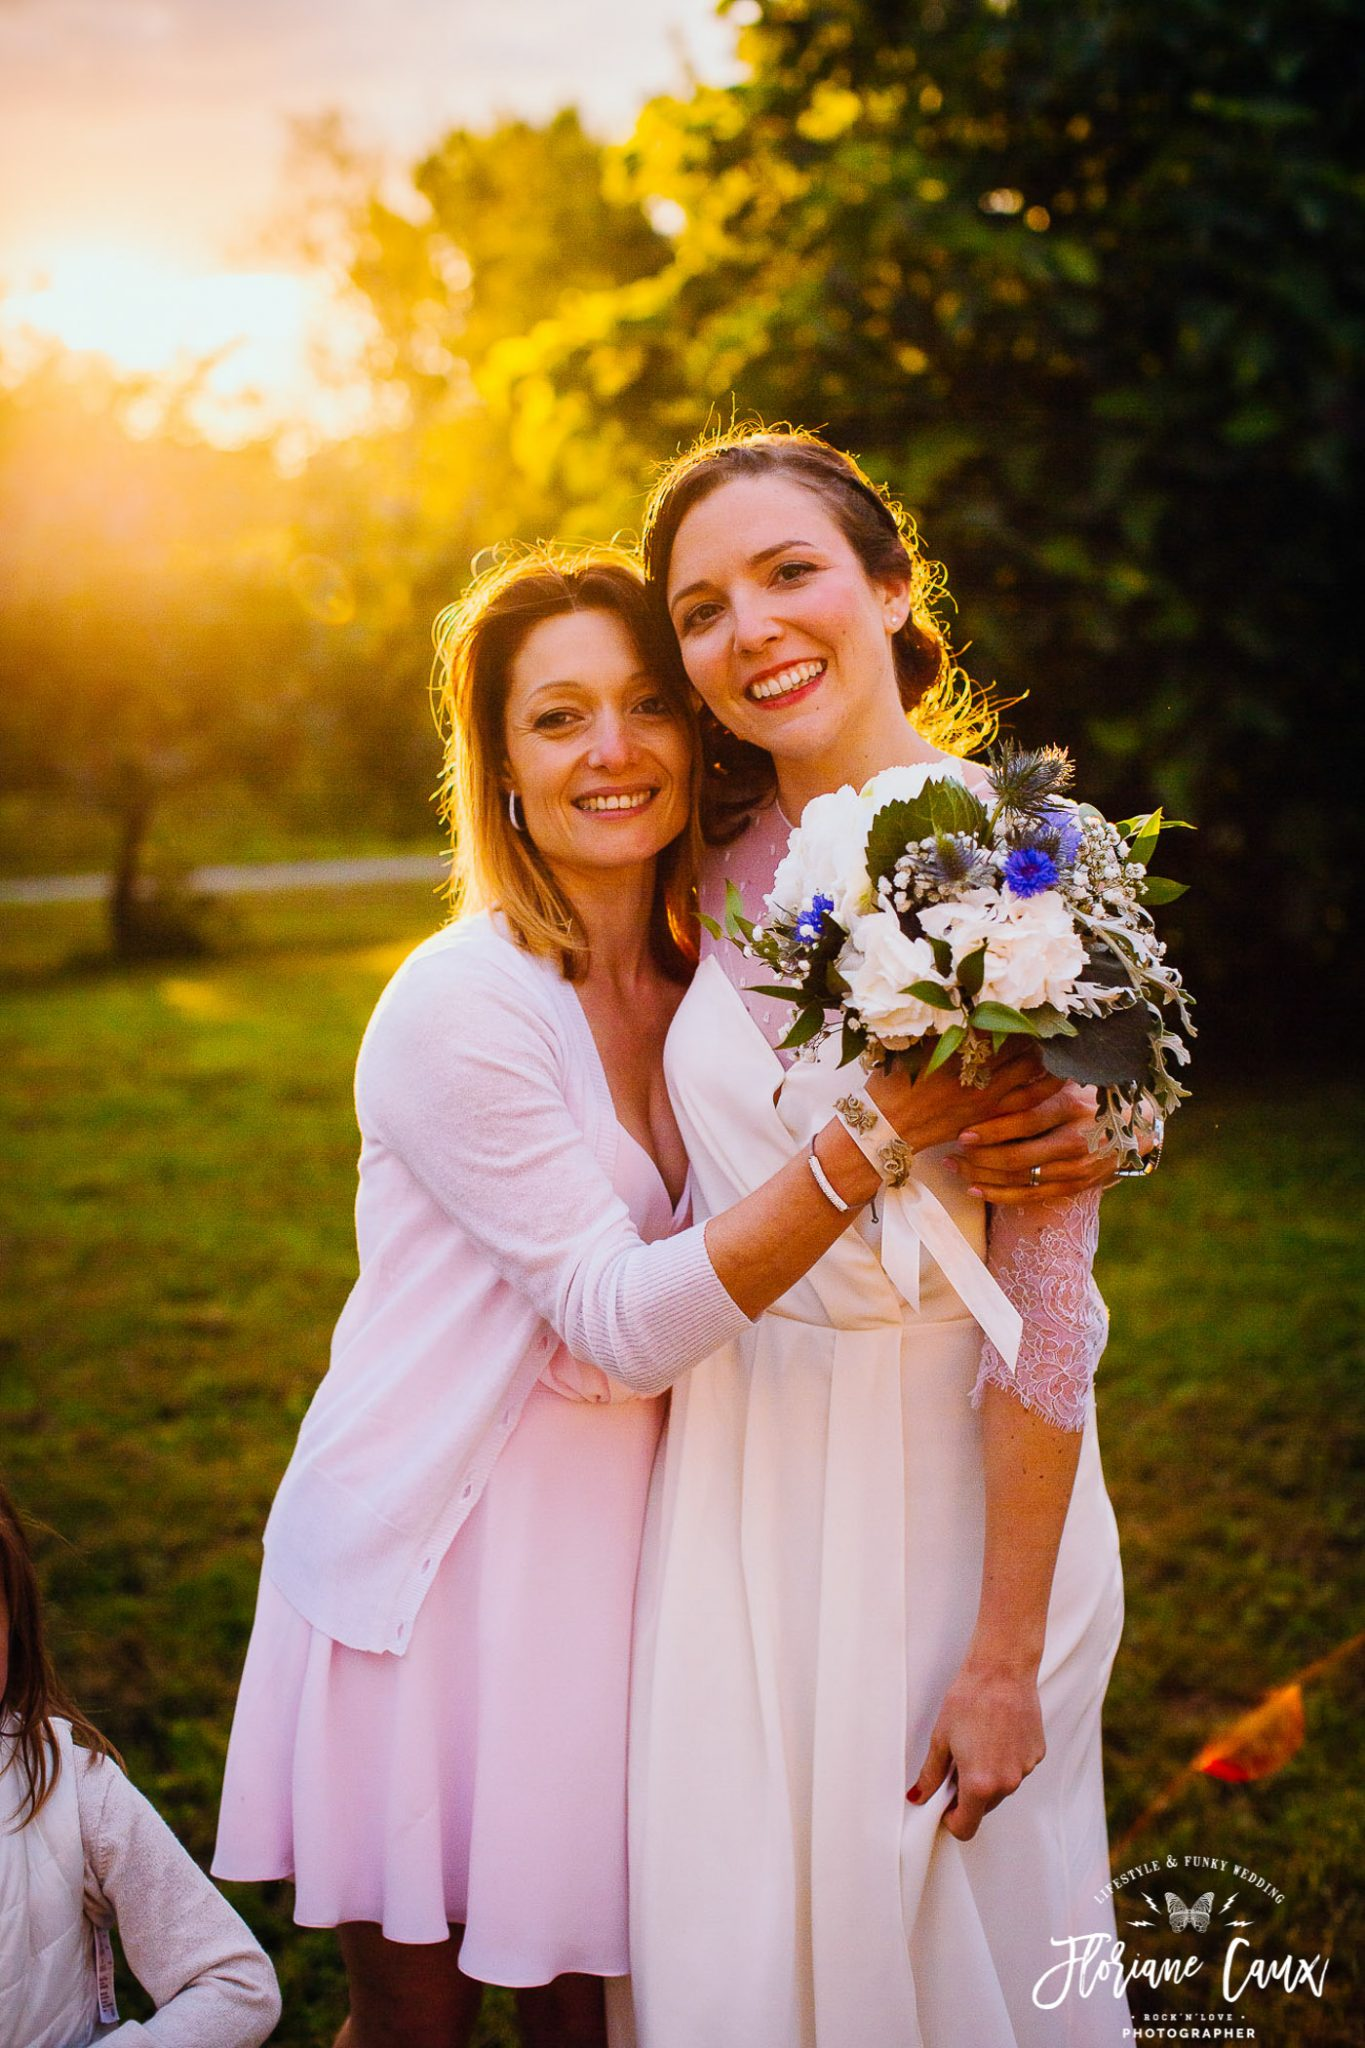 photographe-mariage-pays-basque-Floriane-Caux (89)